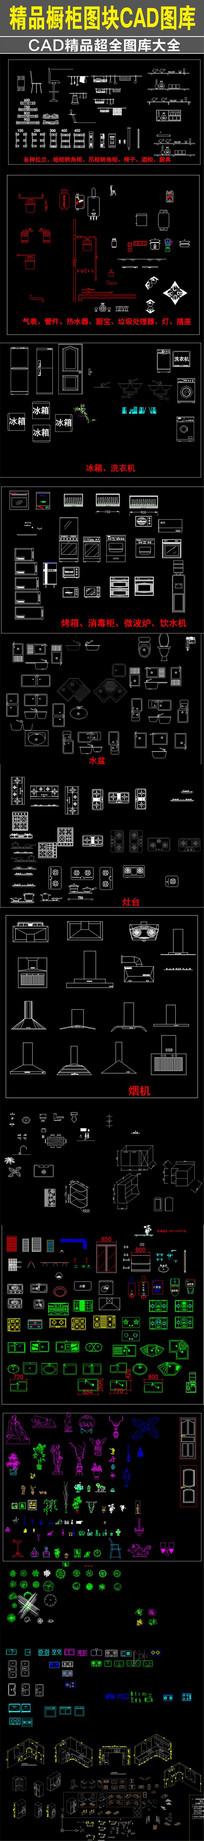 精品橱柜图块CAD图库 dwg